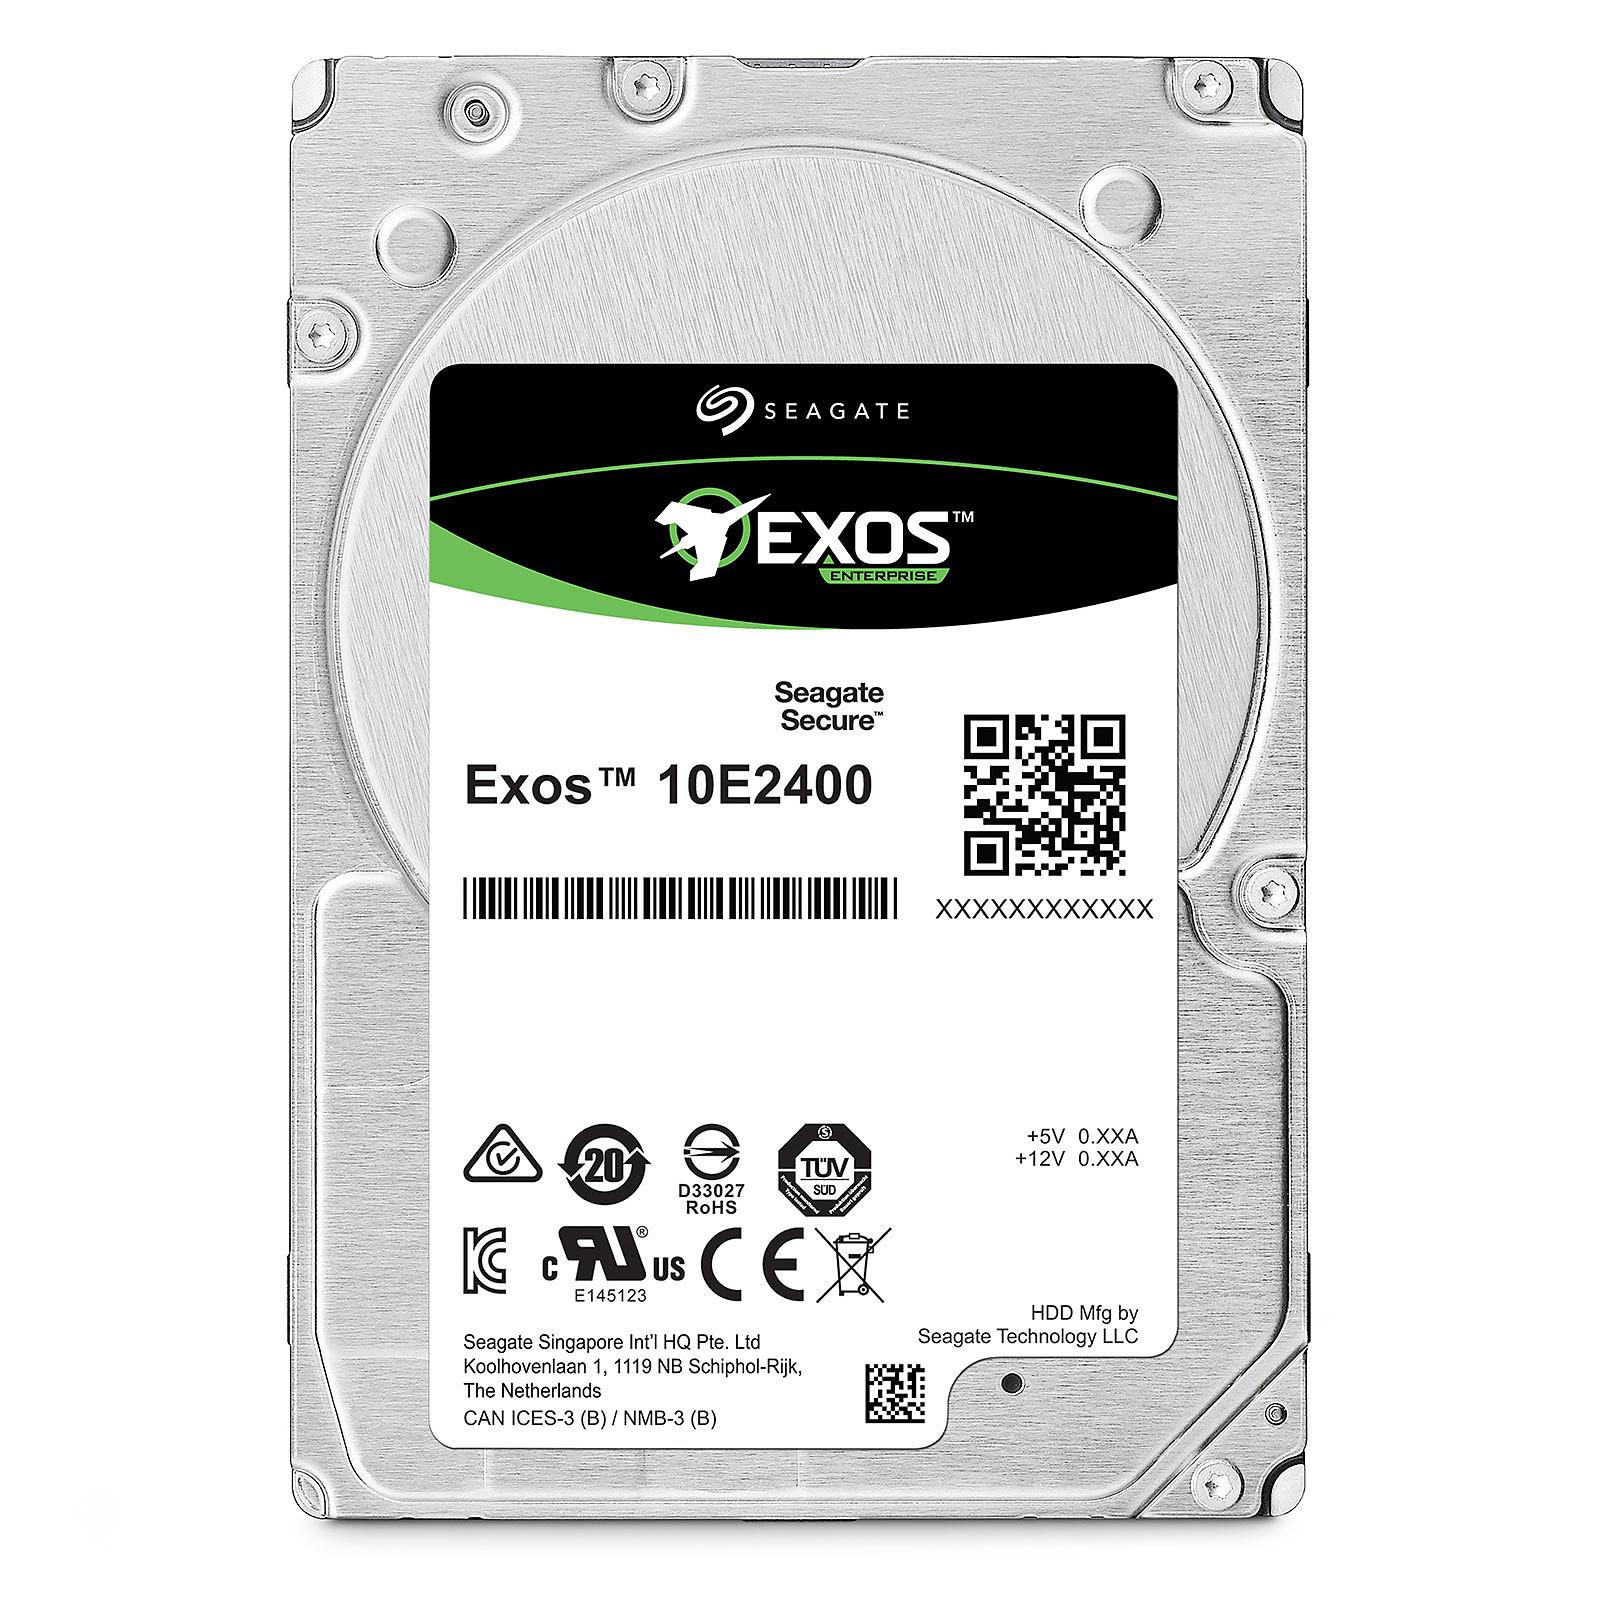 Seagate Exos 10E2400 300 Go